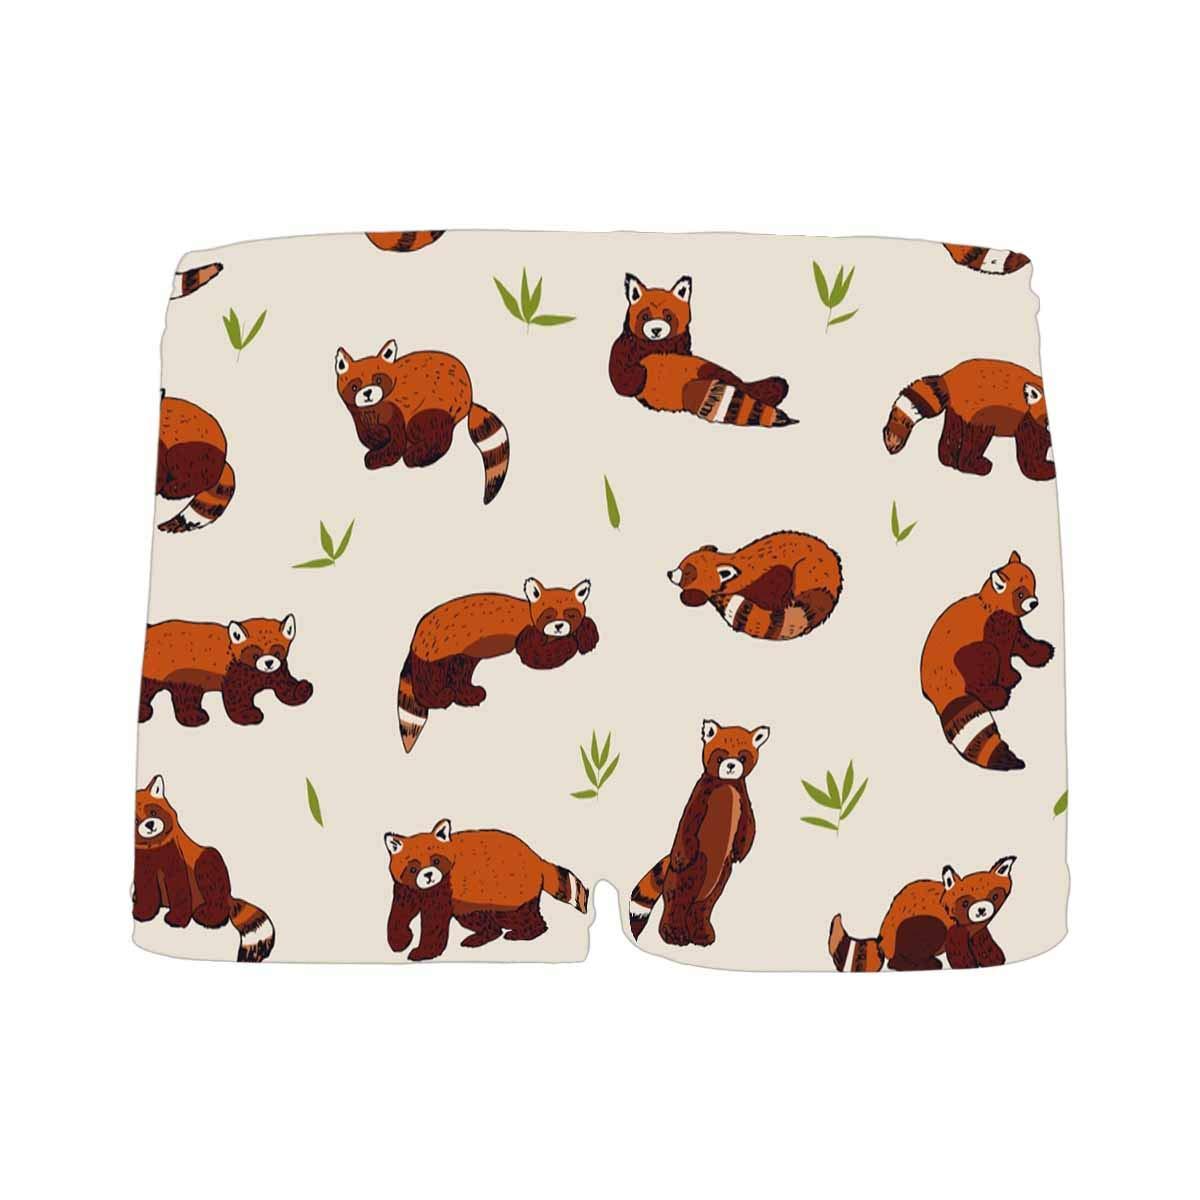 INTERESTPRINT Kids Cute Red Panda Animal Cartoon Comfortable Breathable Briefs 5T-2XL